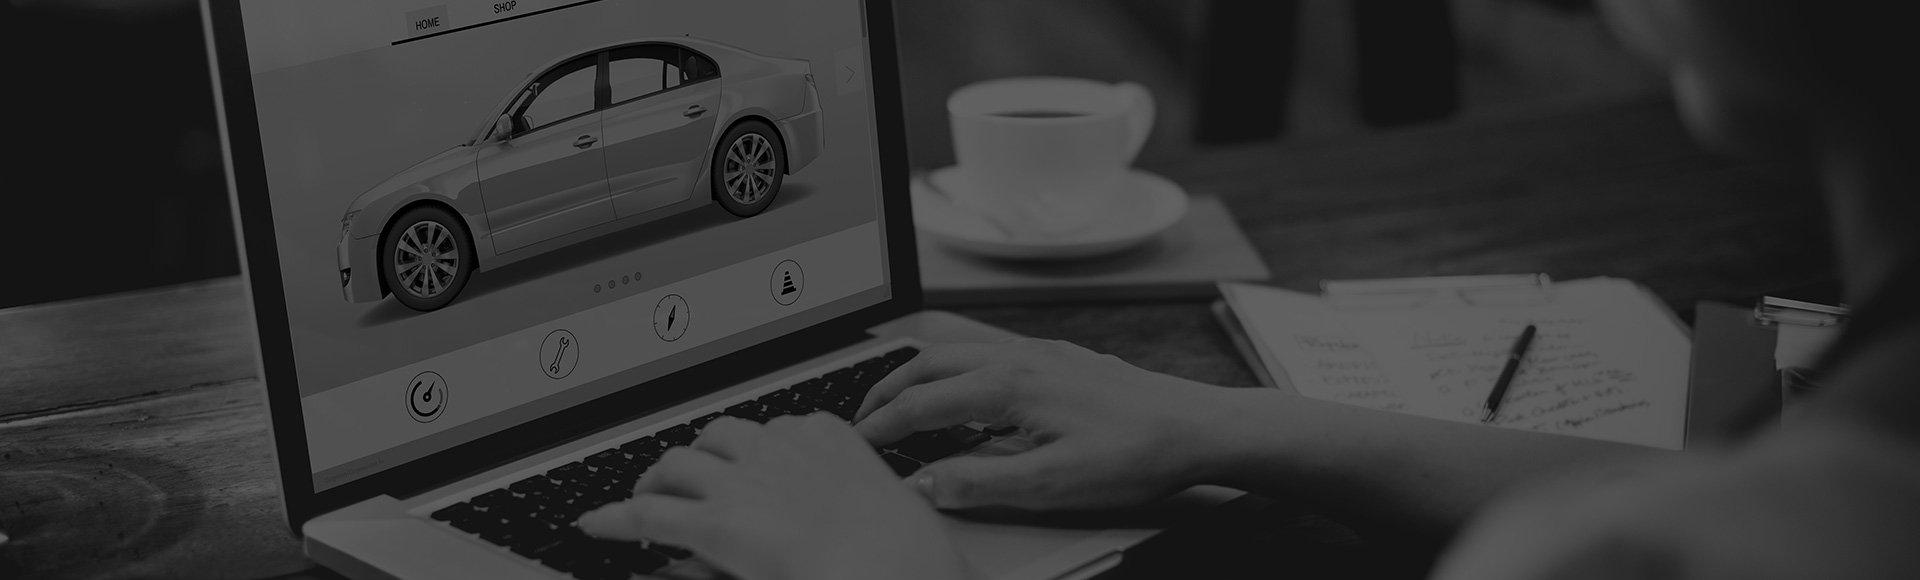 Automotive-marketing